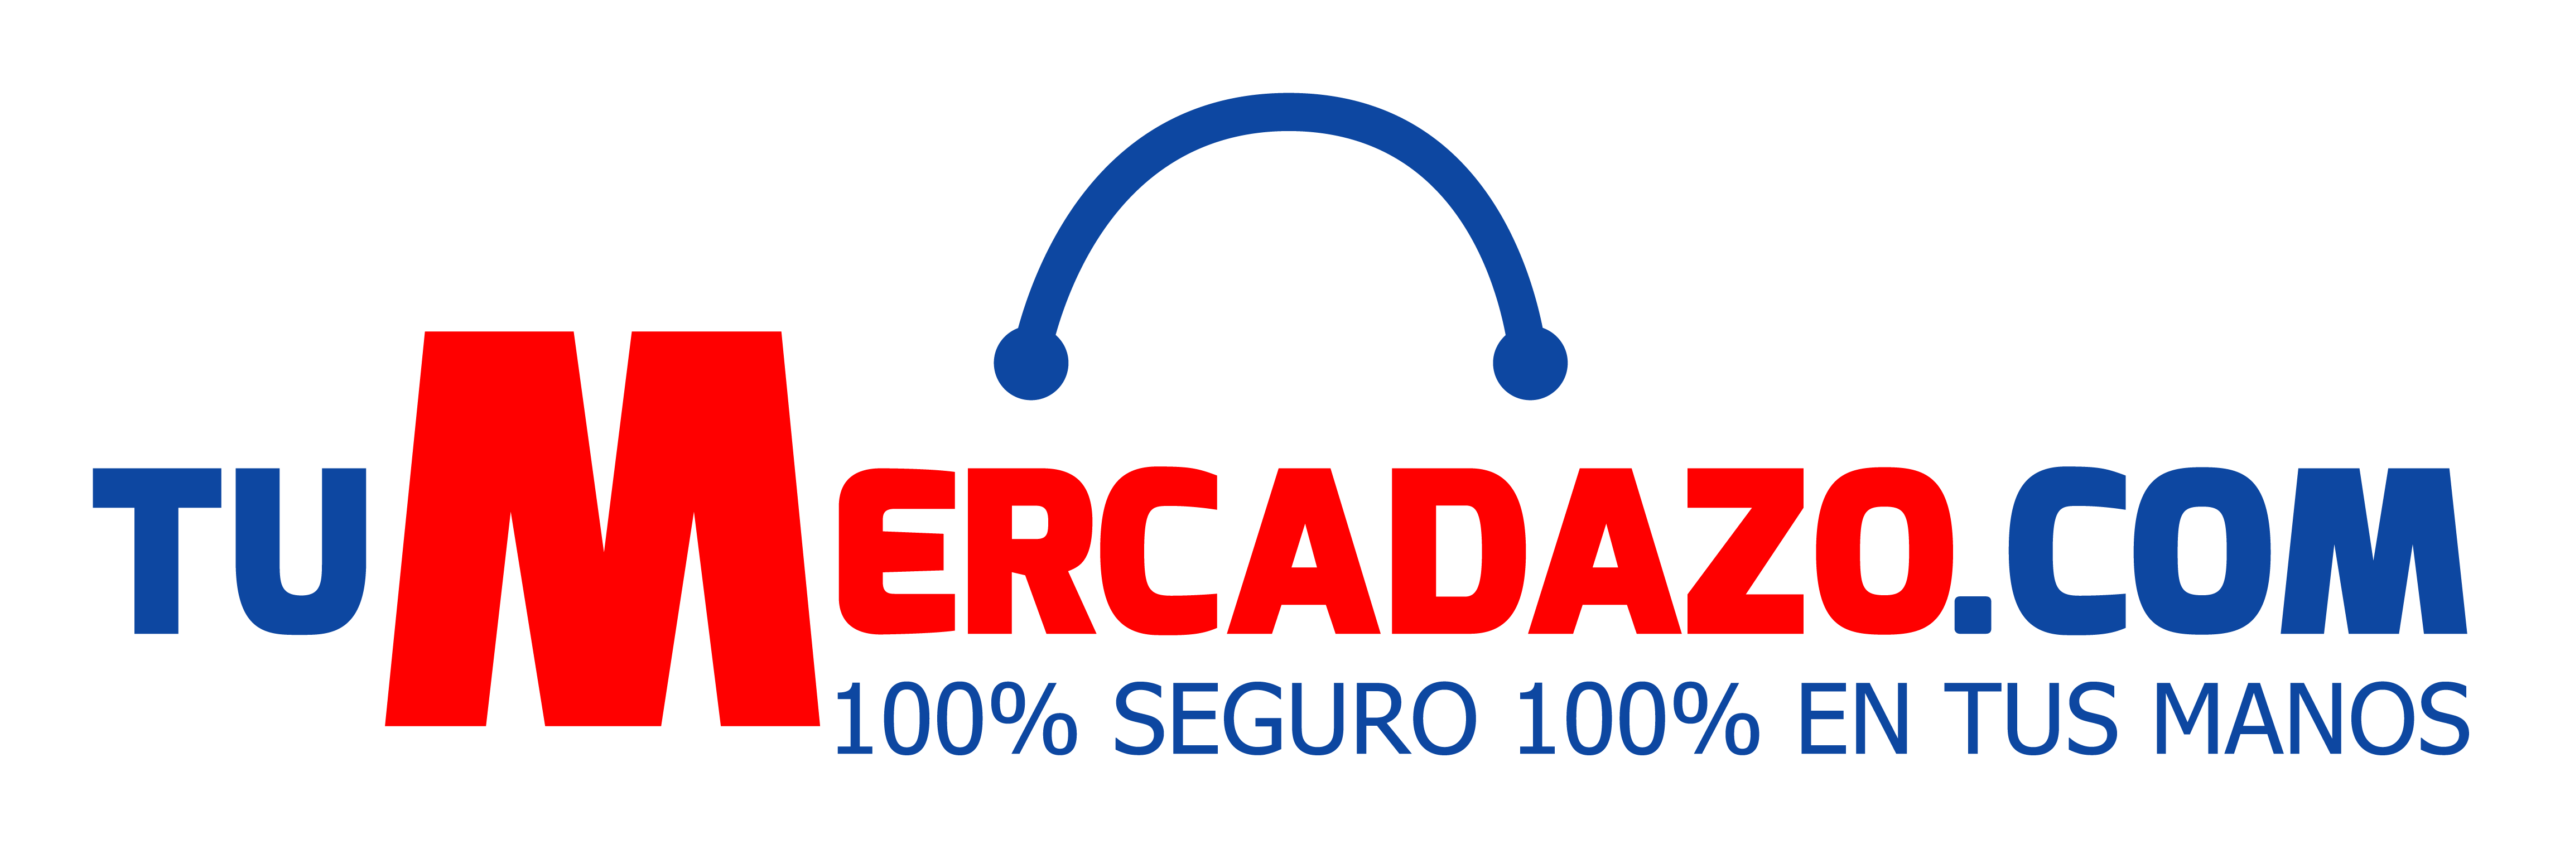 Logotipo TuMercadazo